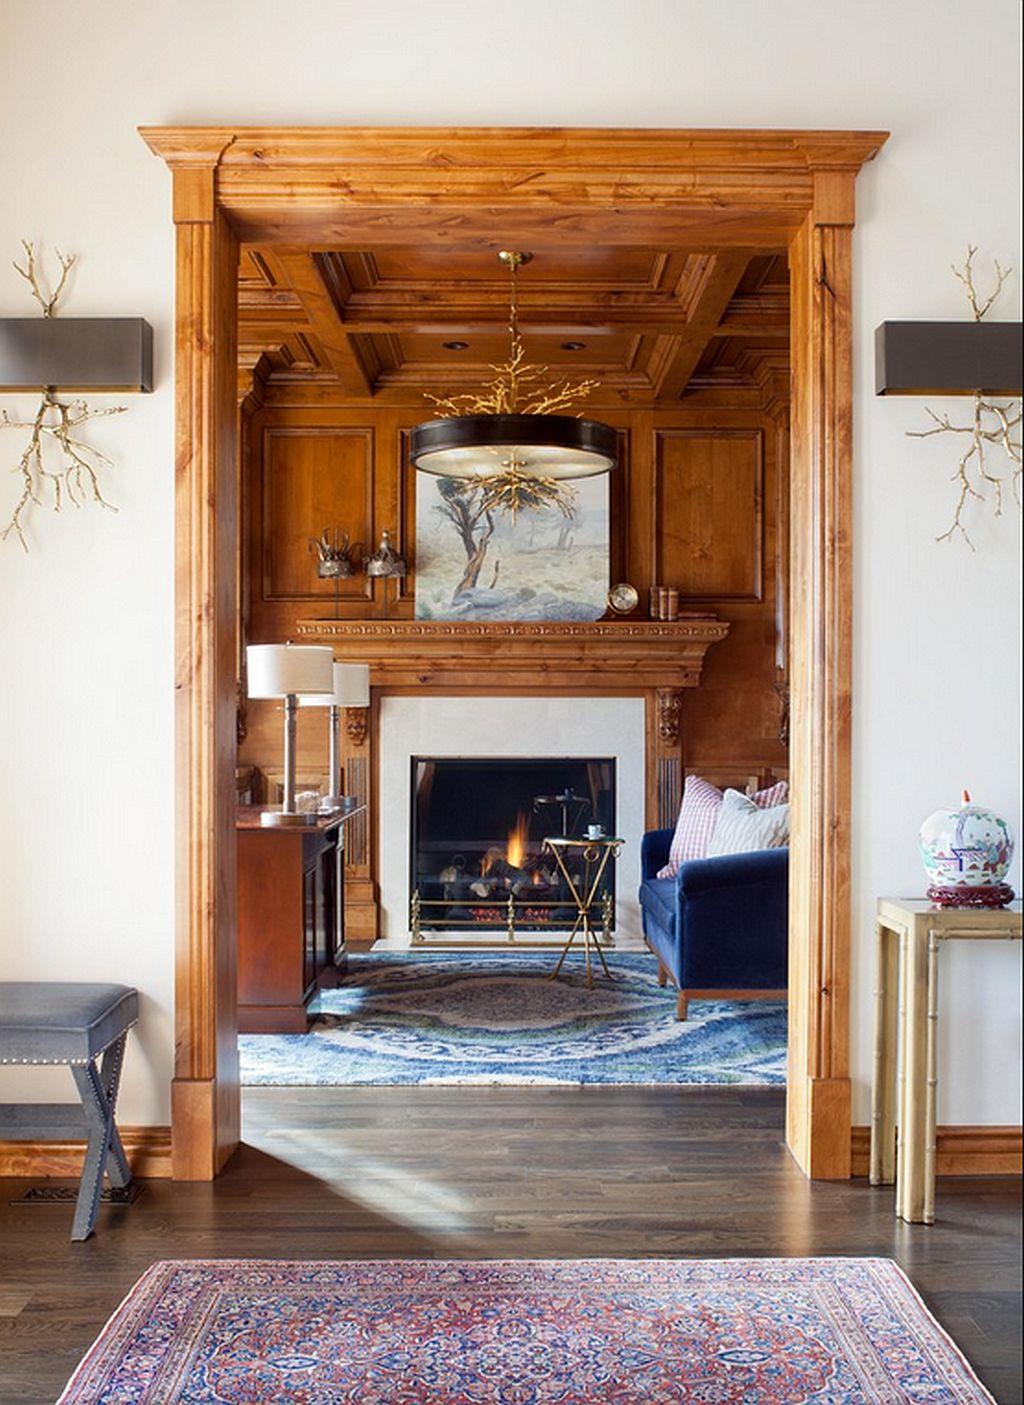 adelaparvu.com casa rustic clasica designer Andrea Schumacher (3)